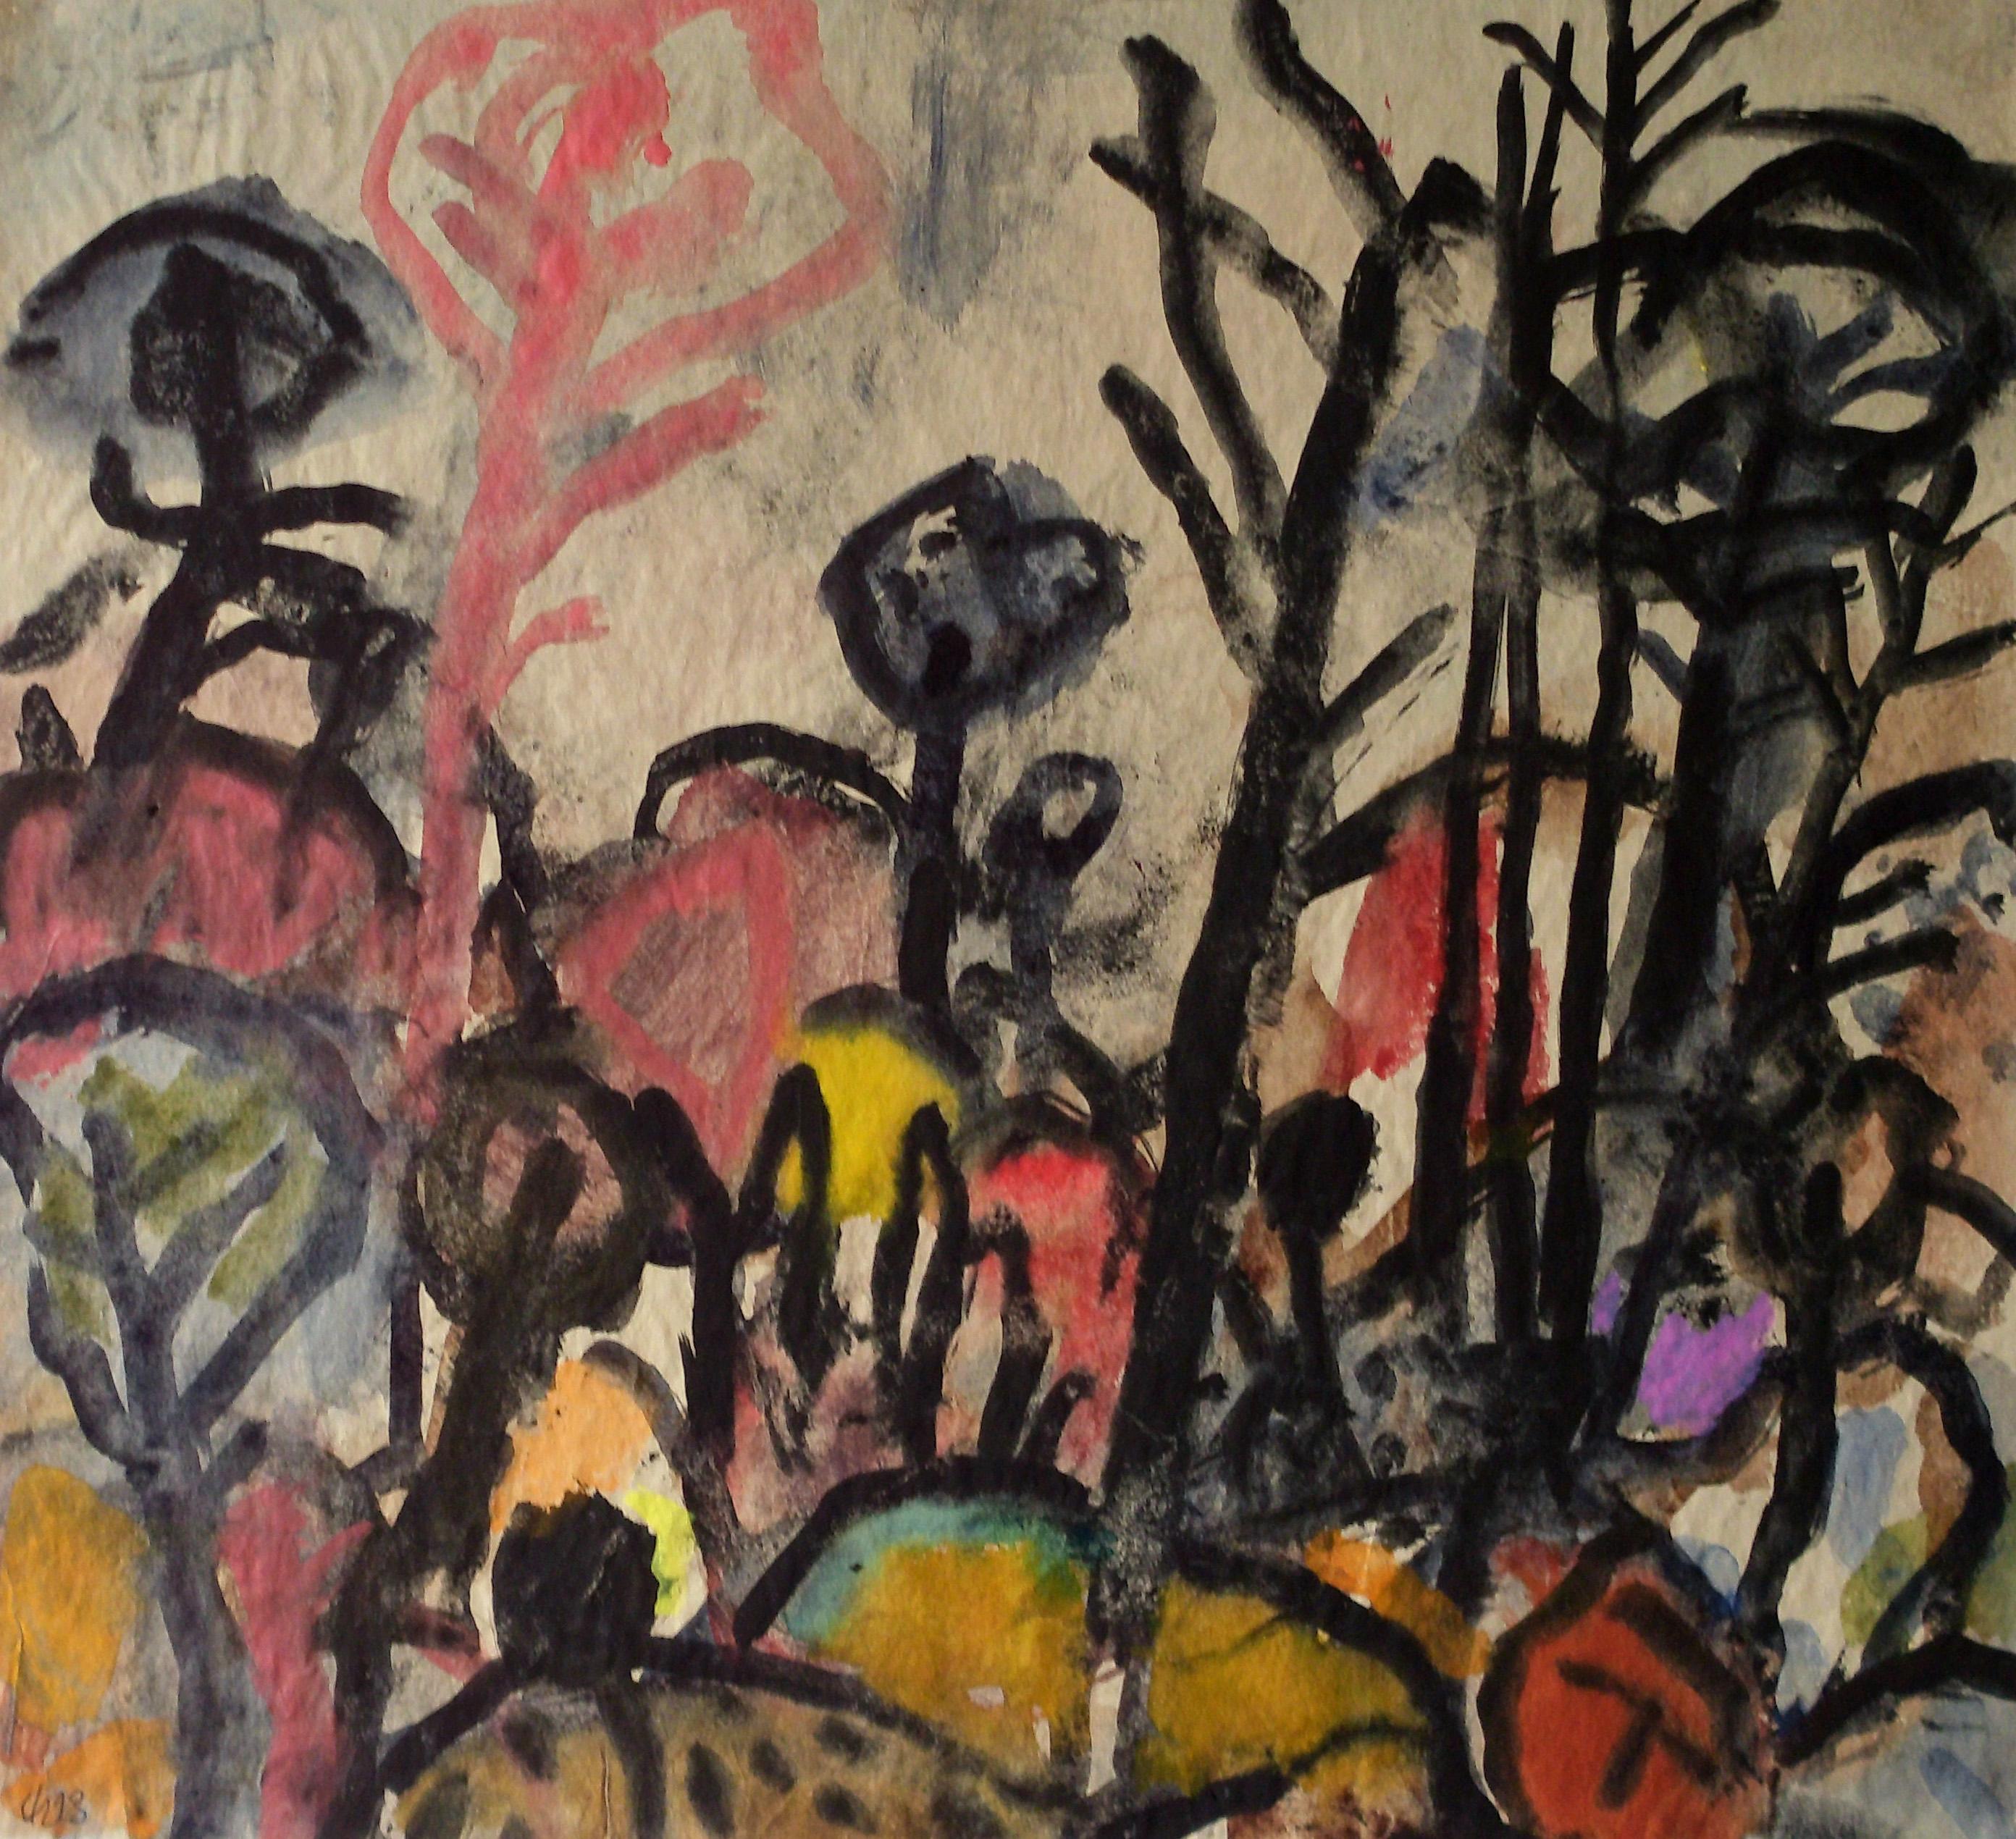 04-christian_hasse-waldlandschaft-1998-aquarell-40.5x44.0